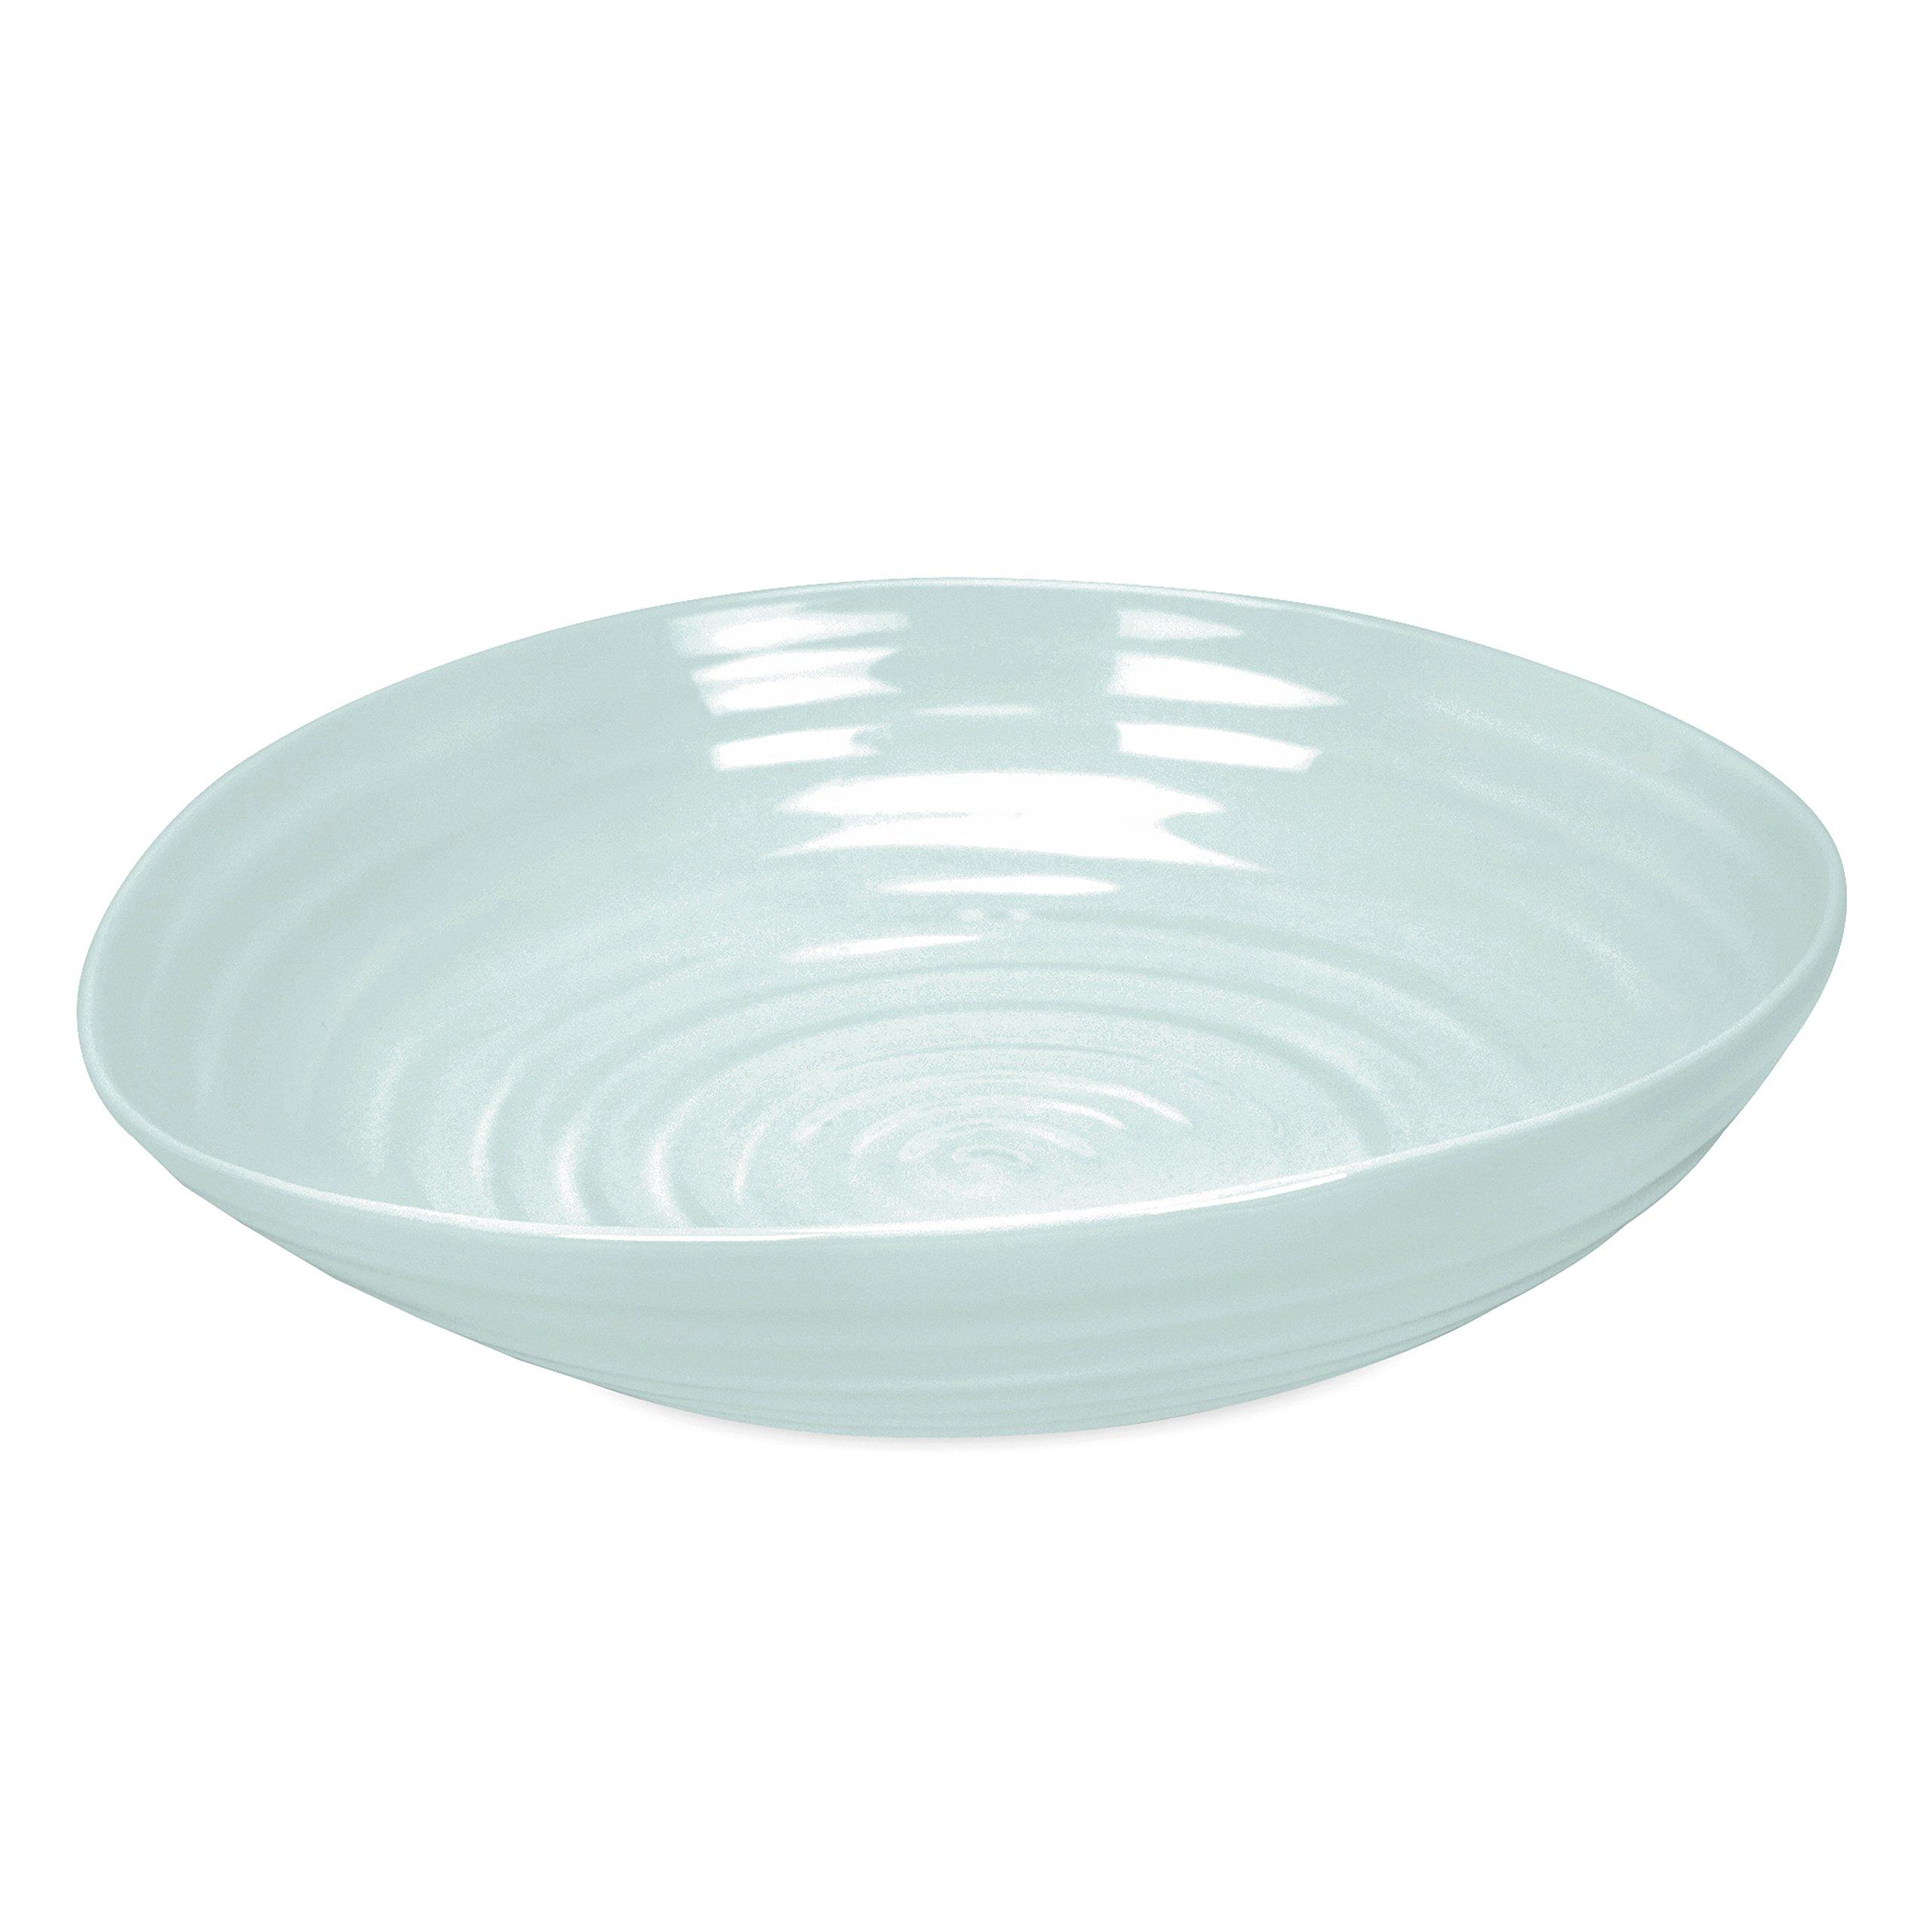 Portmeirion Sophie Conran Celadon Pasta Bowl, Set of 4